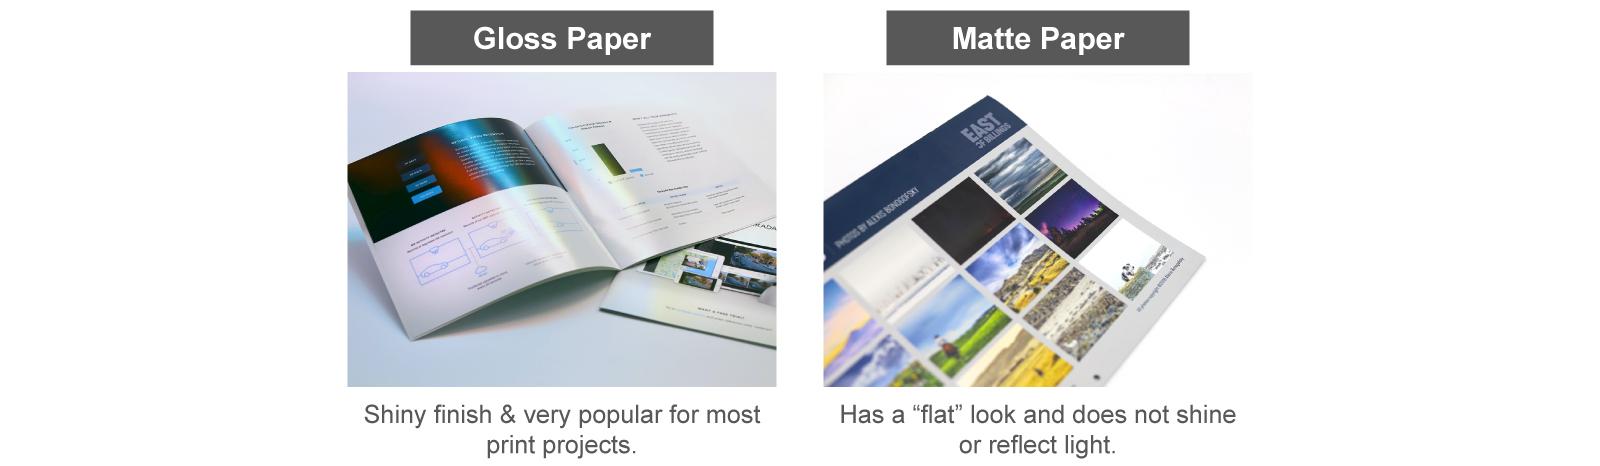 Gloss vs Matte paper